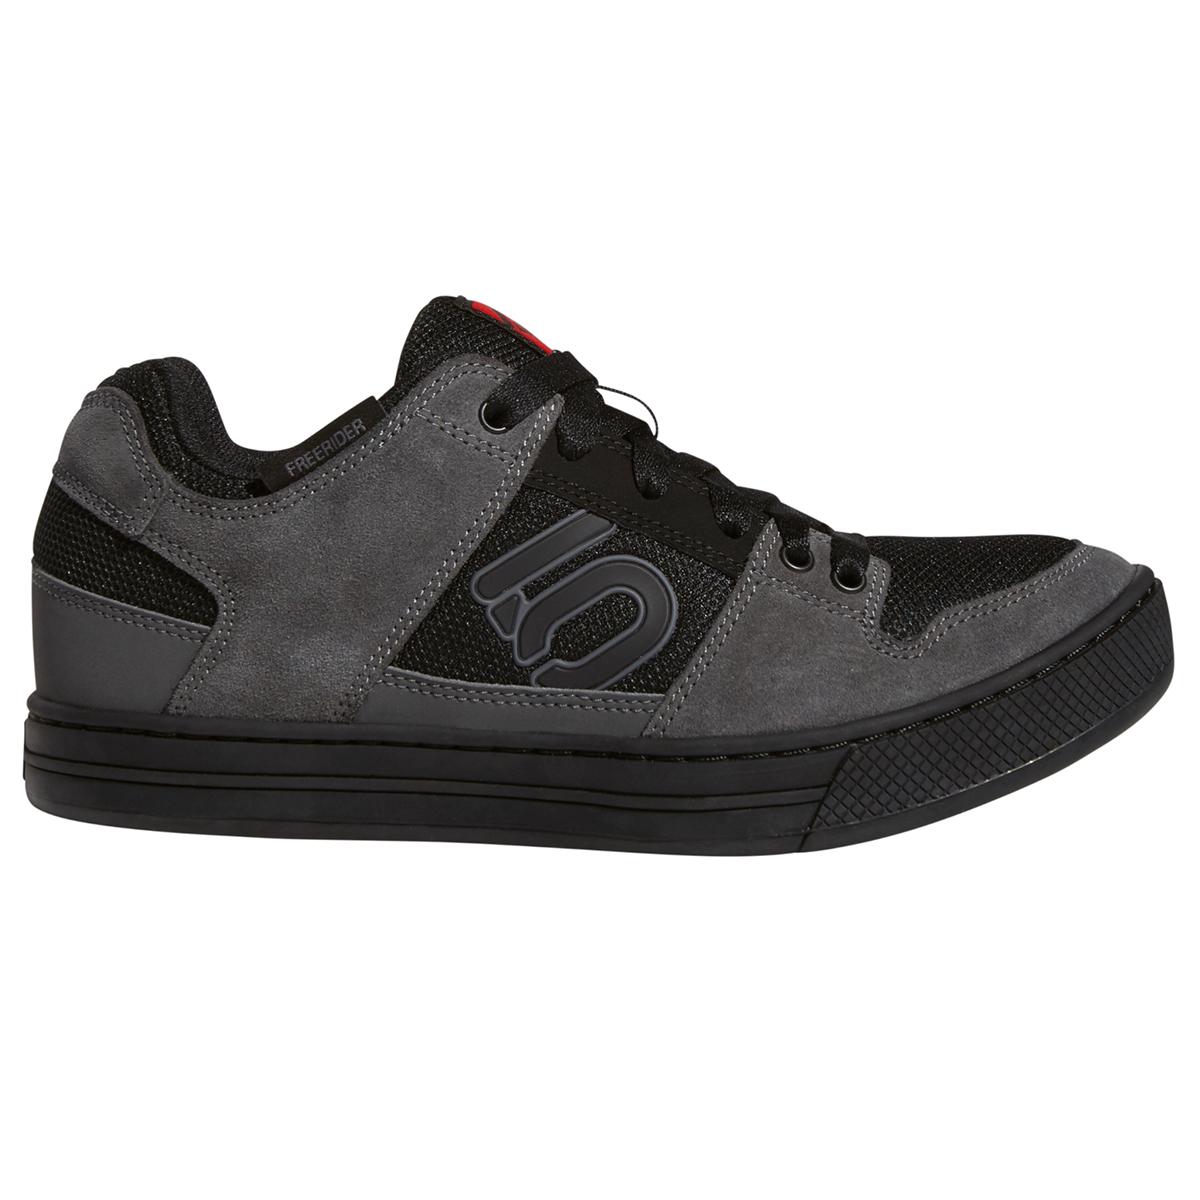 Five.ten Men's Freerider Mountain Bike Shoes - Size 13